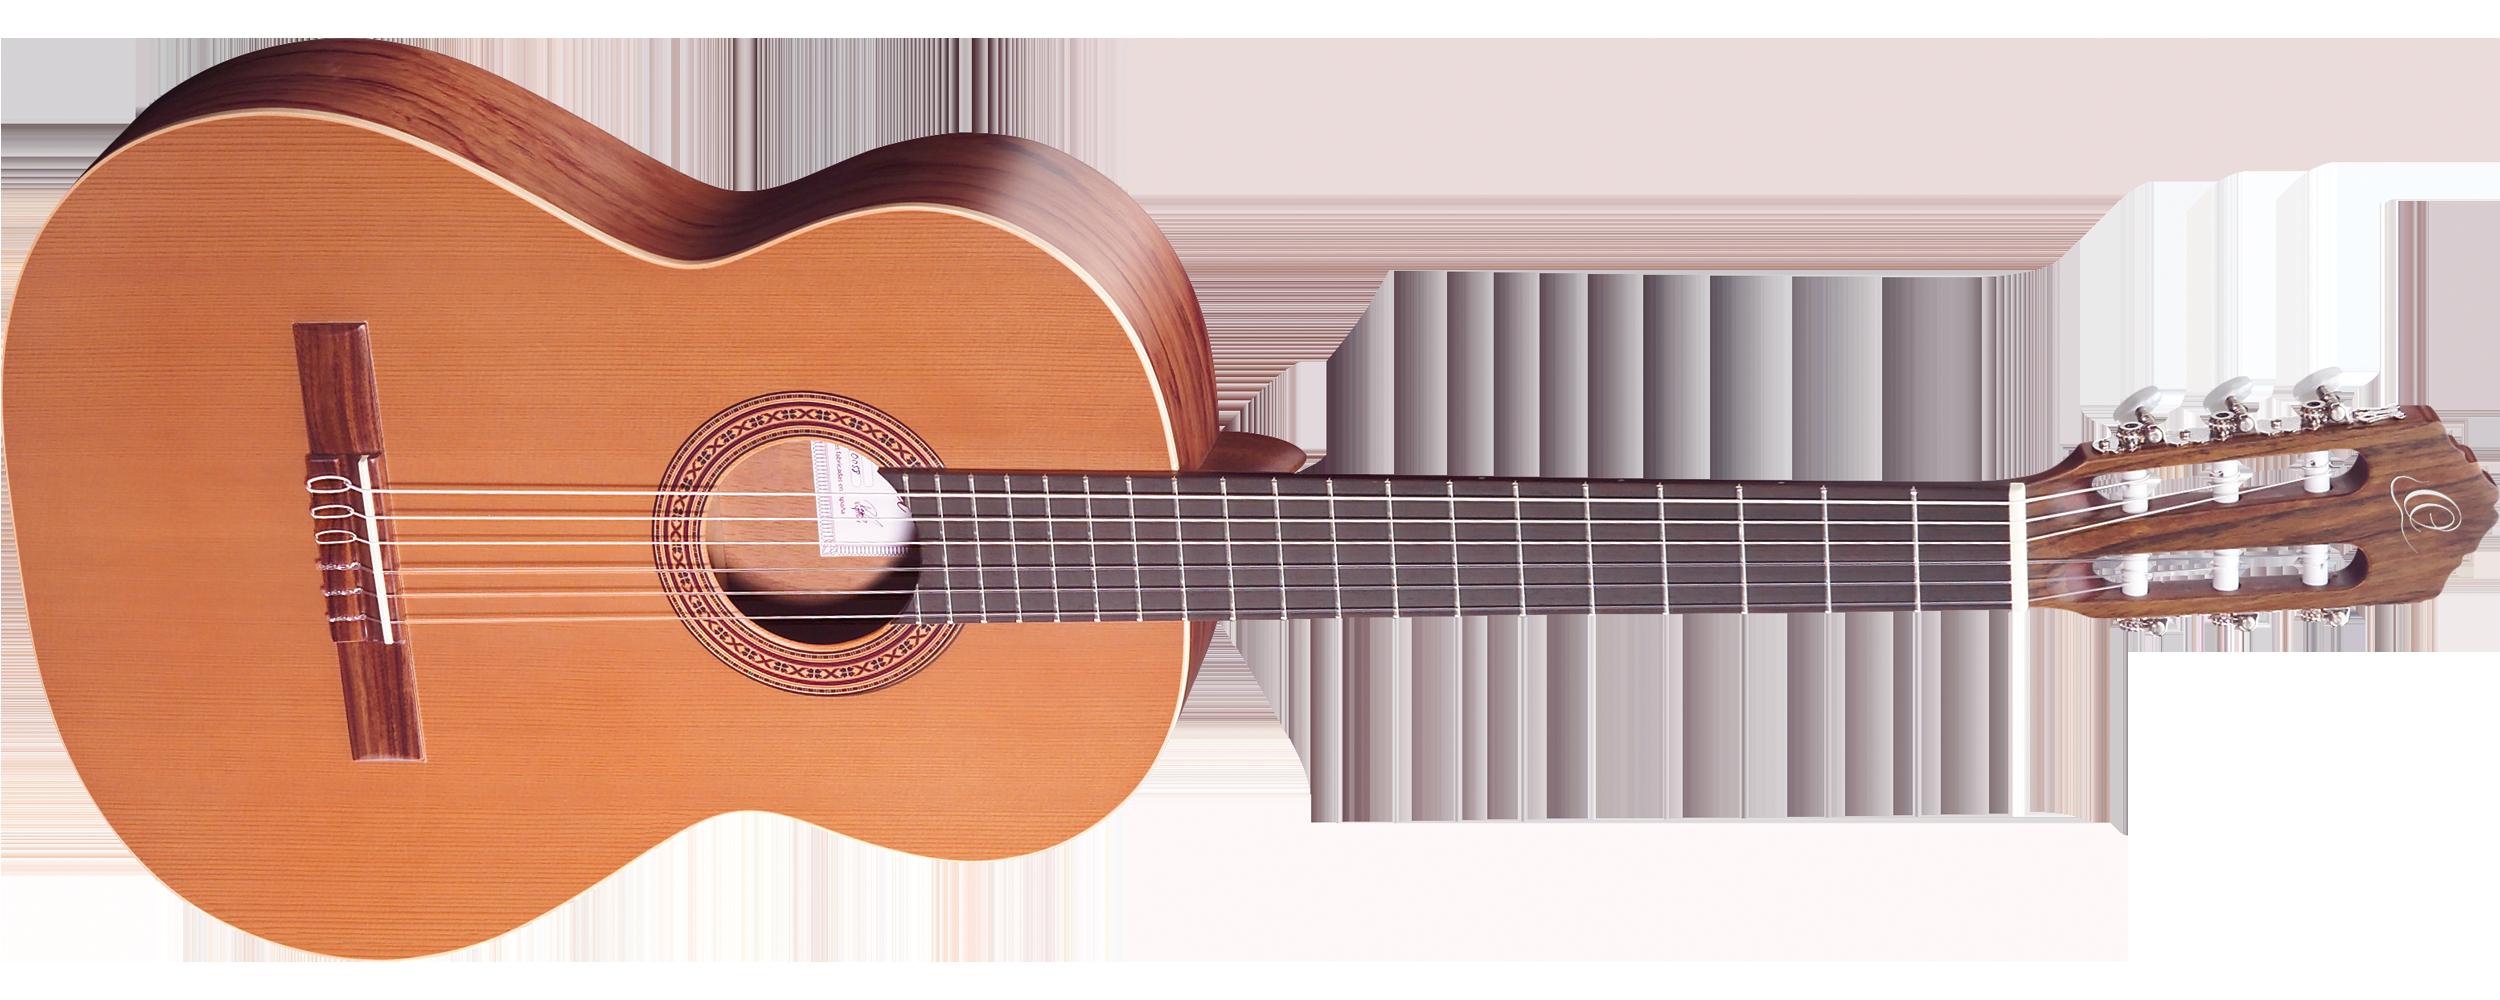 Clipart guitar guitar spain. Ortega your r